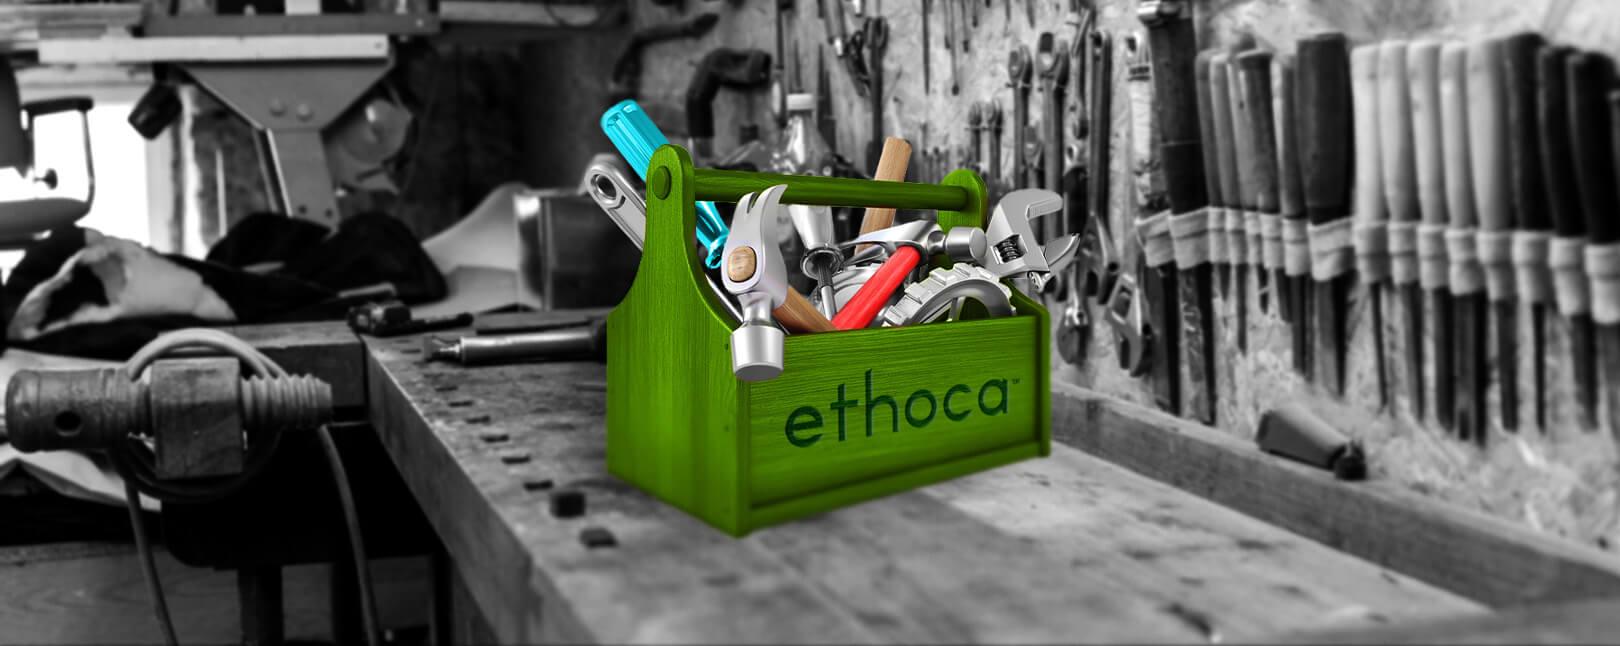 Ethoca chargeback alerts